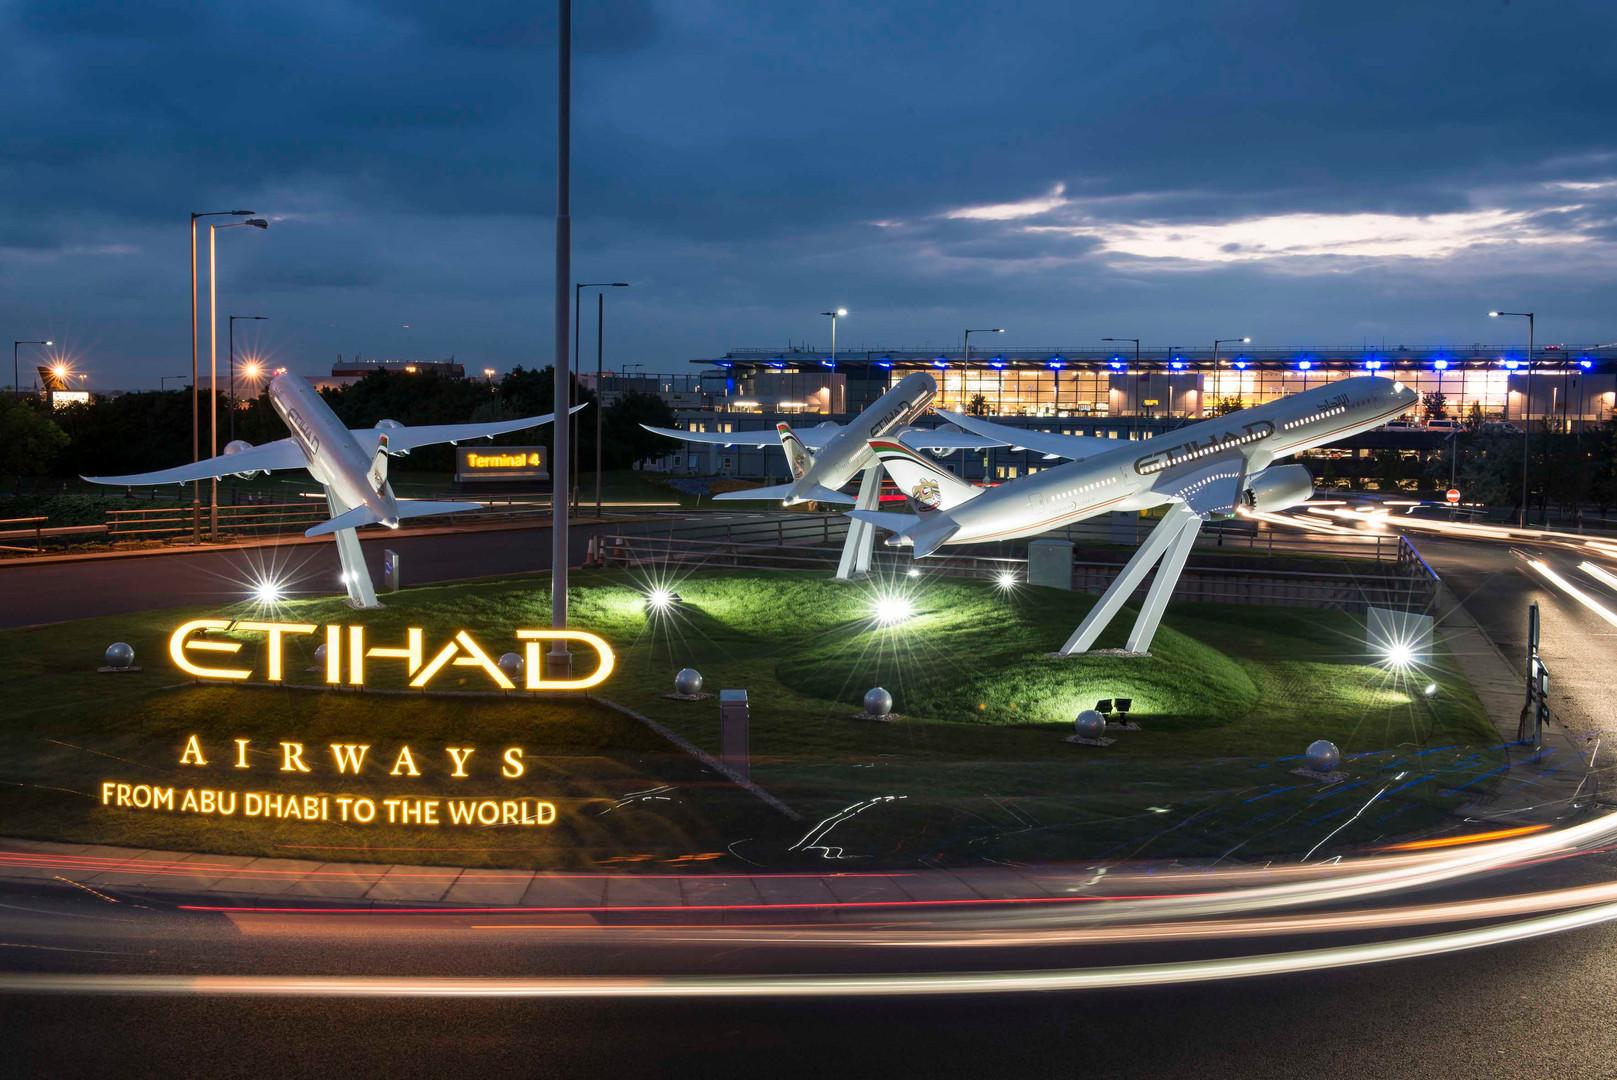 Etihad-roundabout-5.jpg